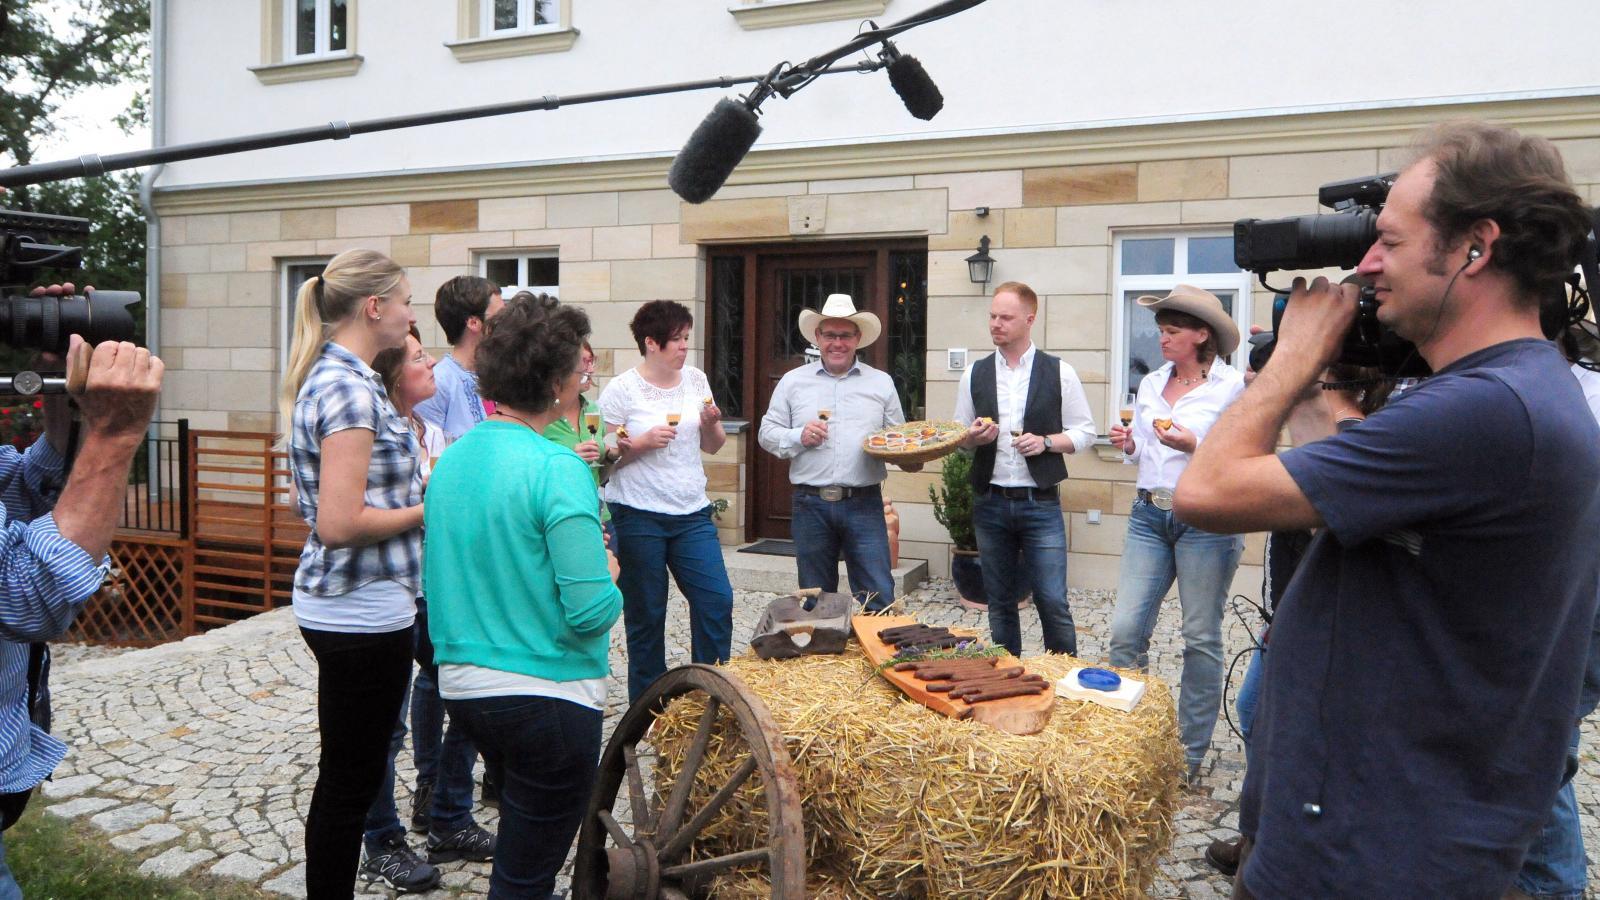 Br Landfrauenküche 9. Staffel Rezepte